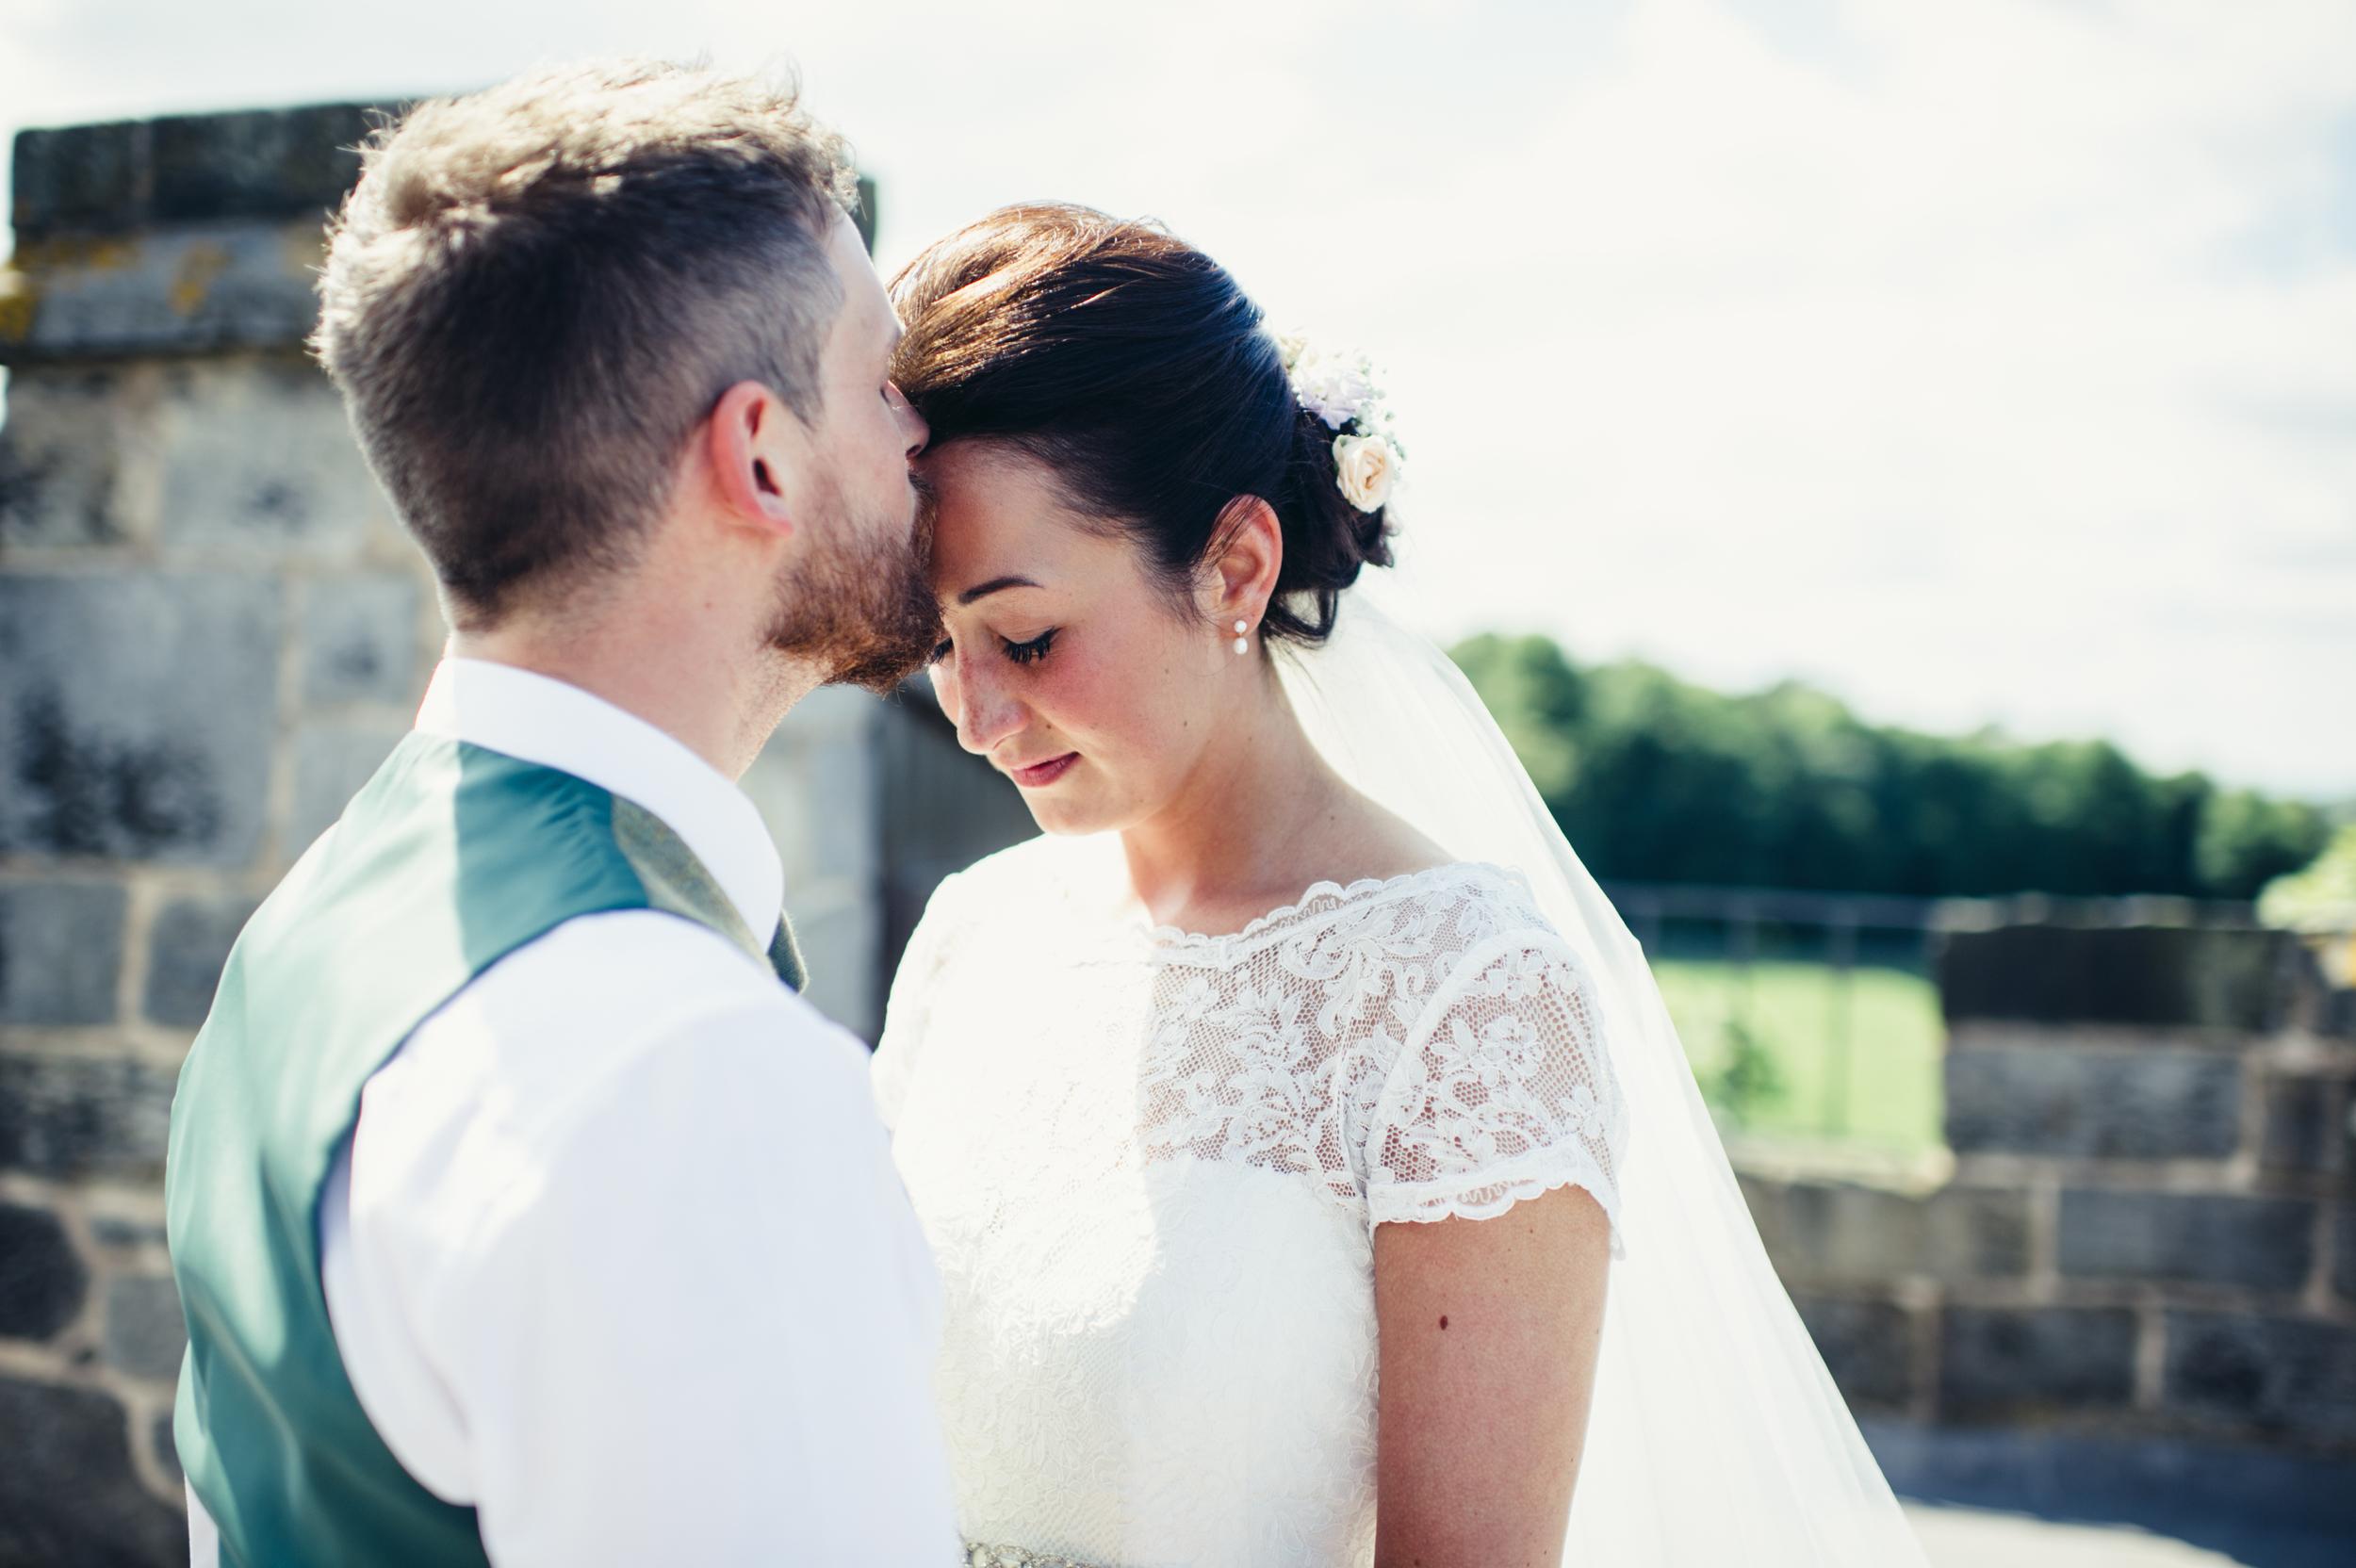 0116-lisa-devine-alternative-creative-wedding-photography-glasgow-edinburgh.JPG